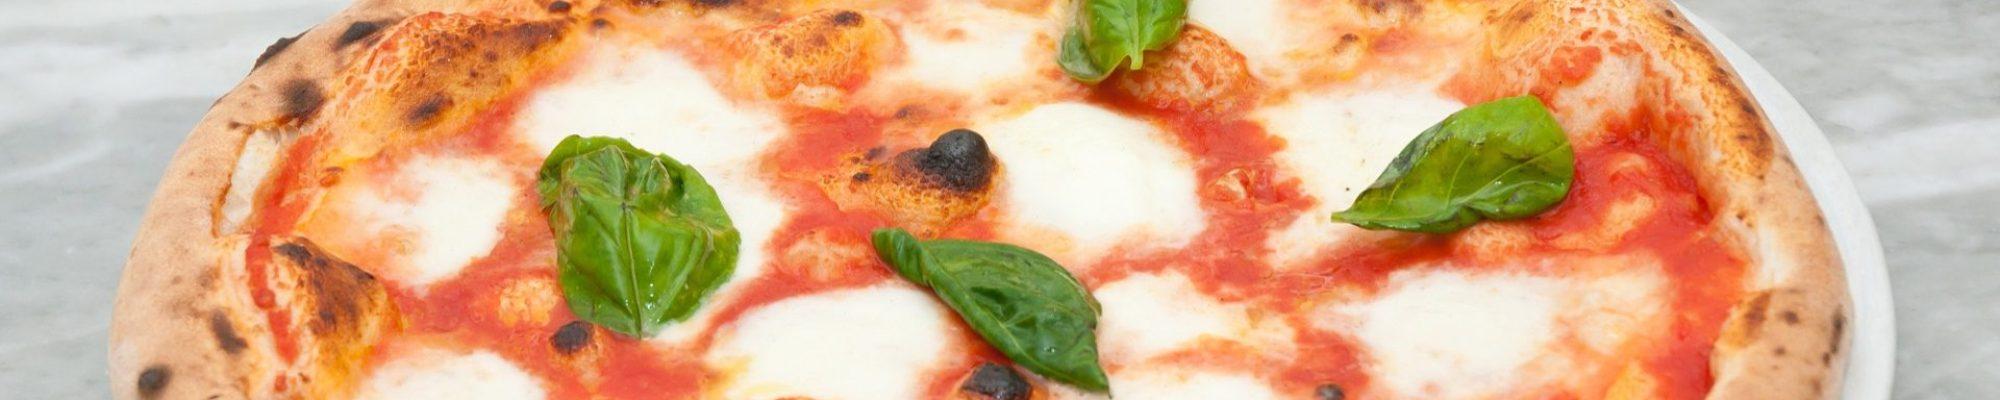 eatinit blarney pizza italian cork cafe - eatin'it